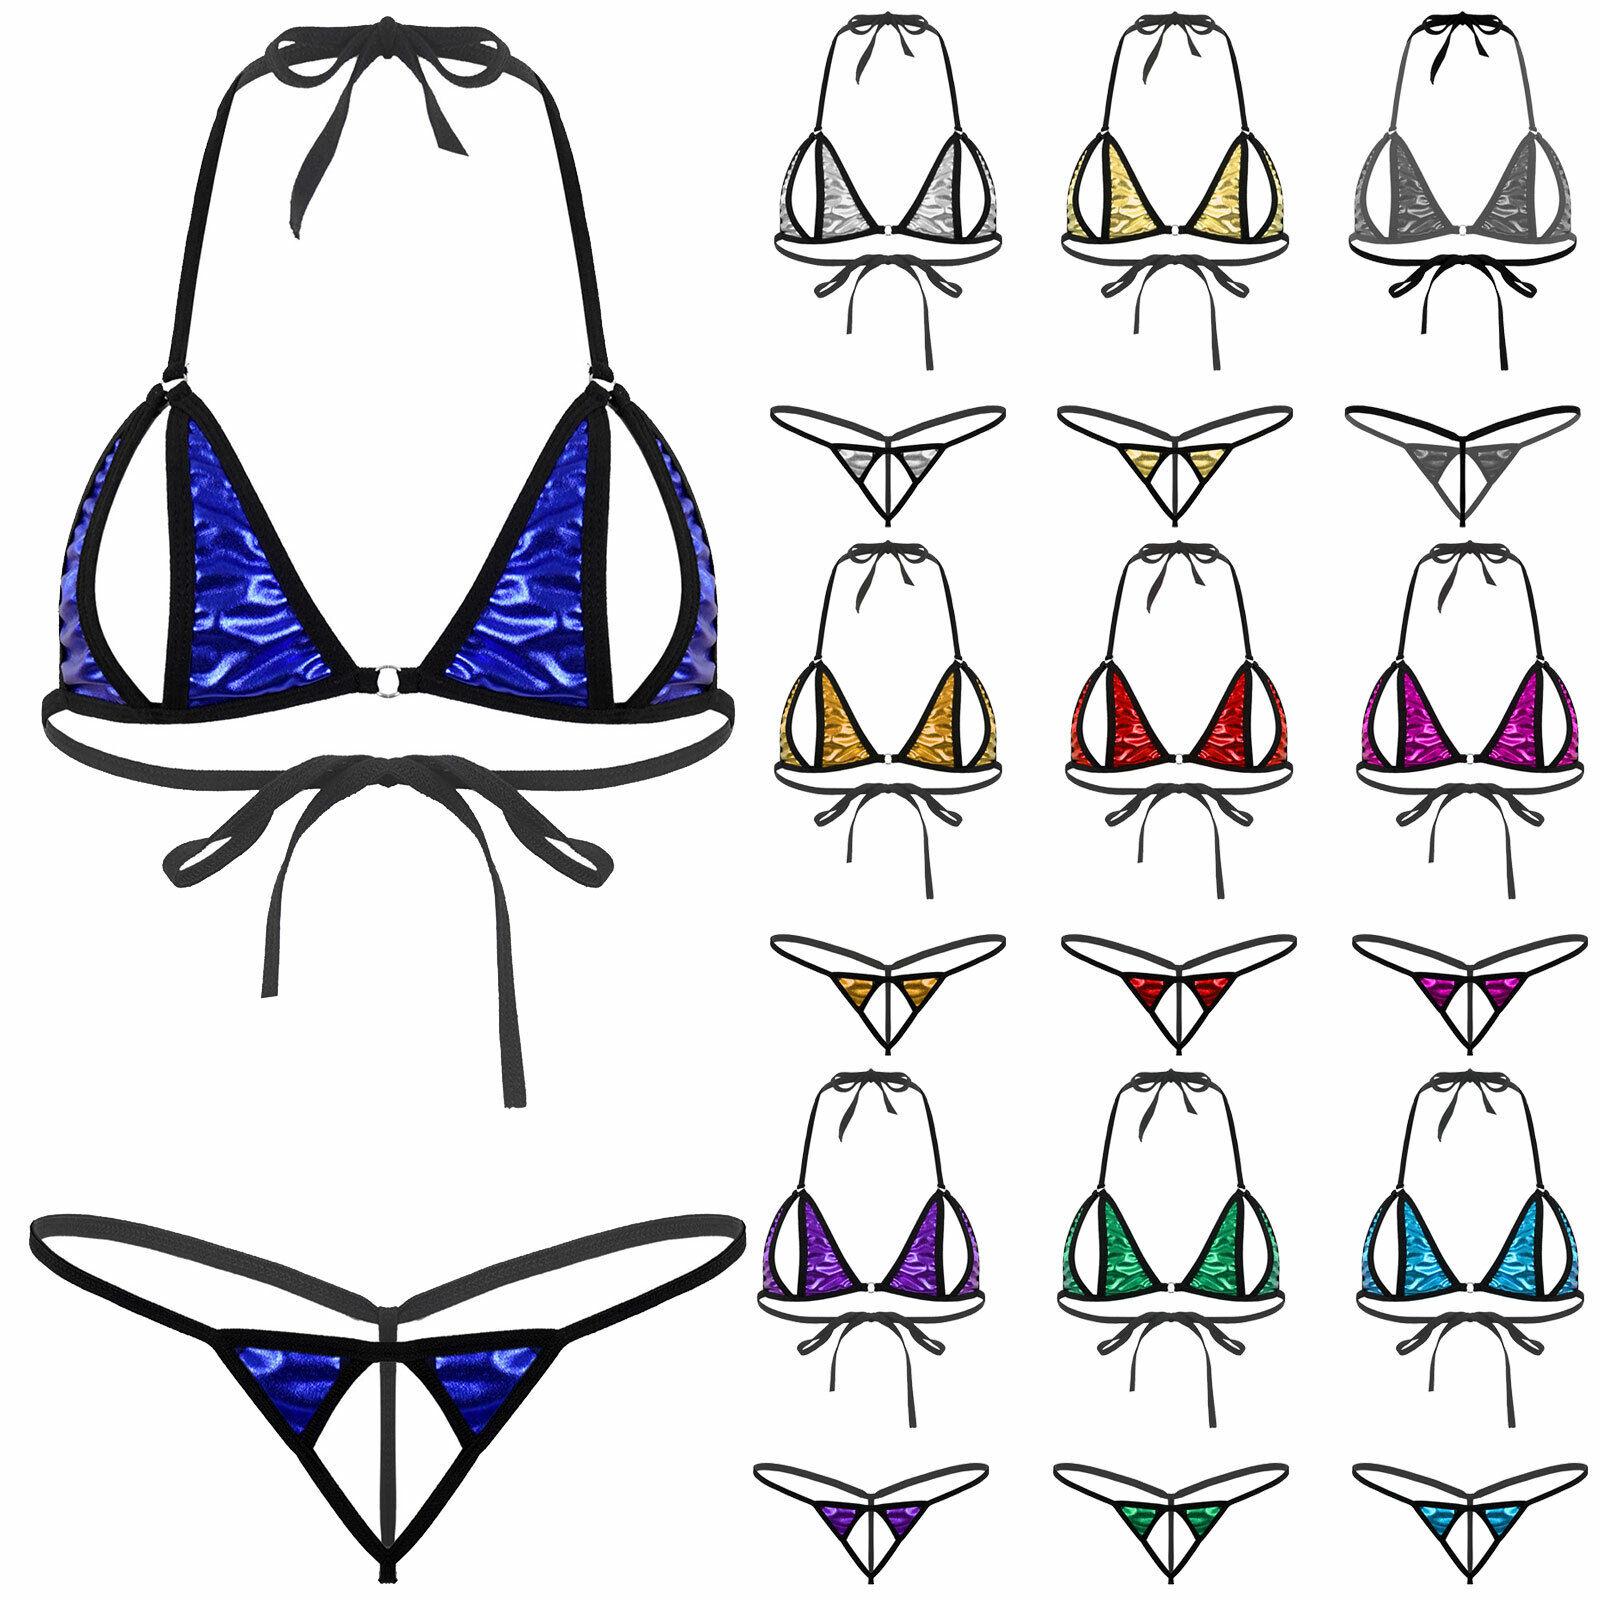 Ladies Bikini Set Lingerie Metallic Dual Stage Swimwear Bra with ouvertslip